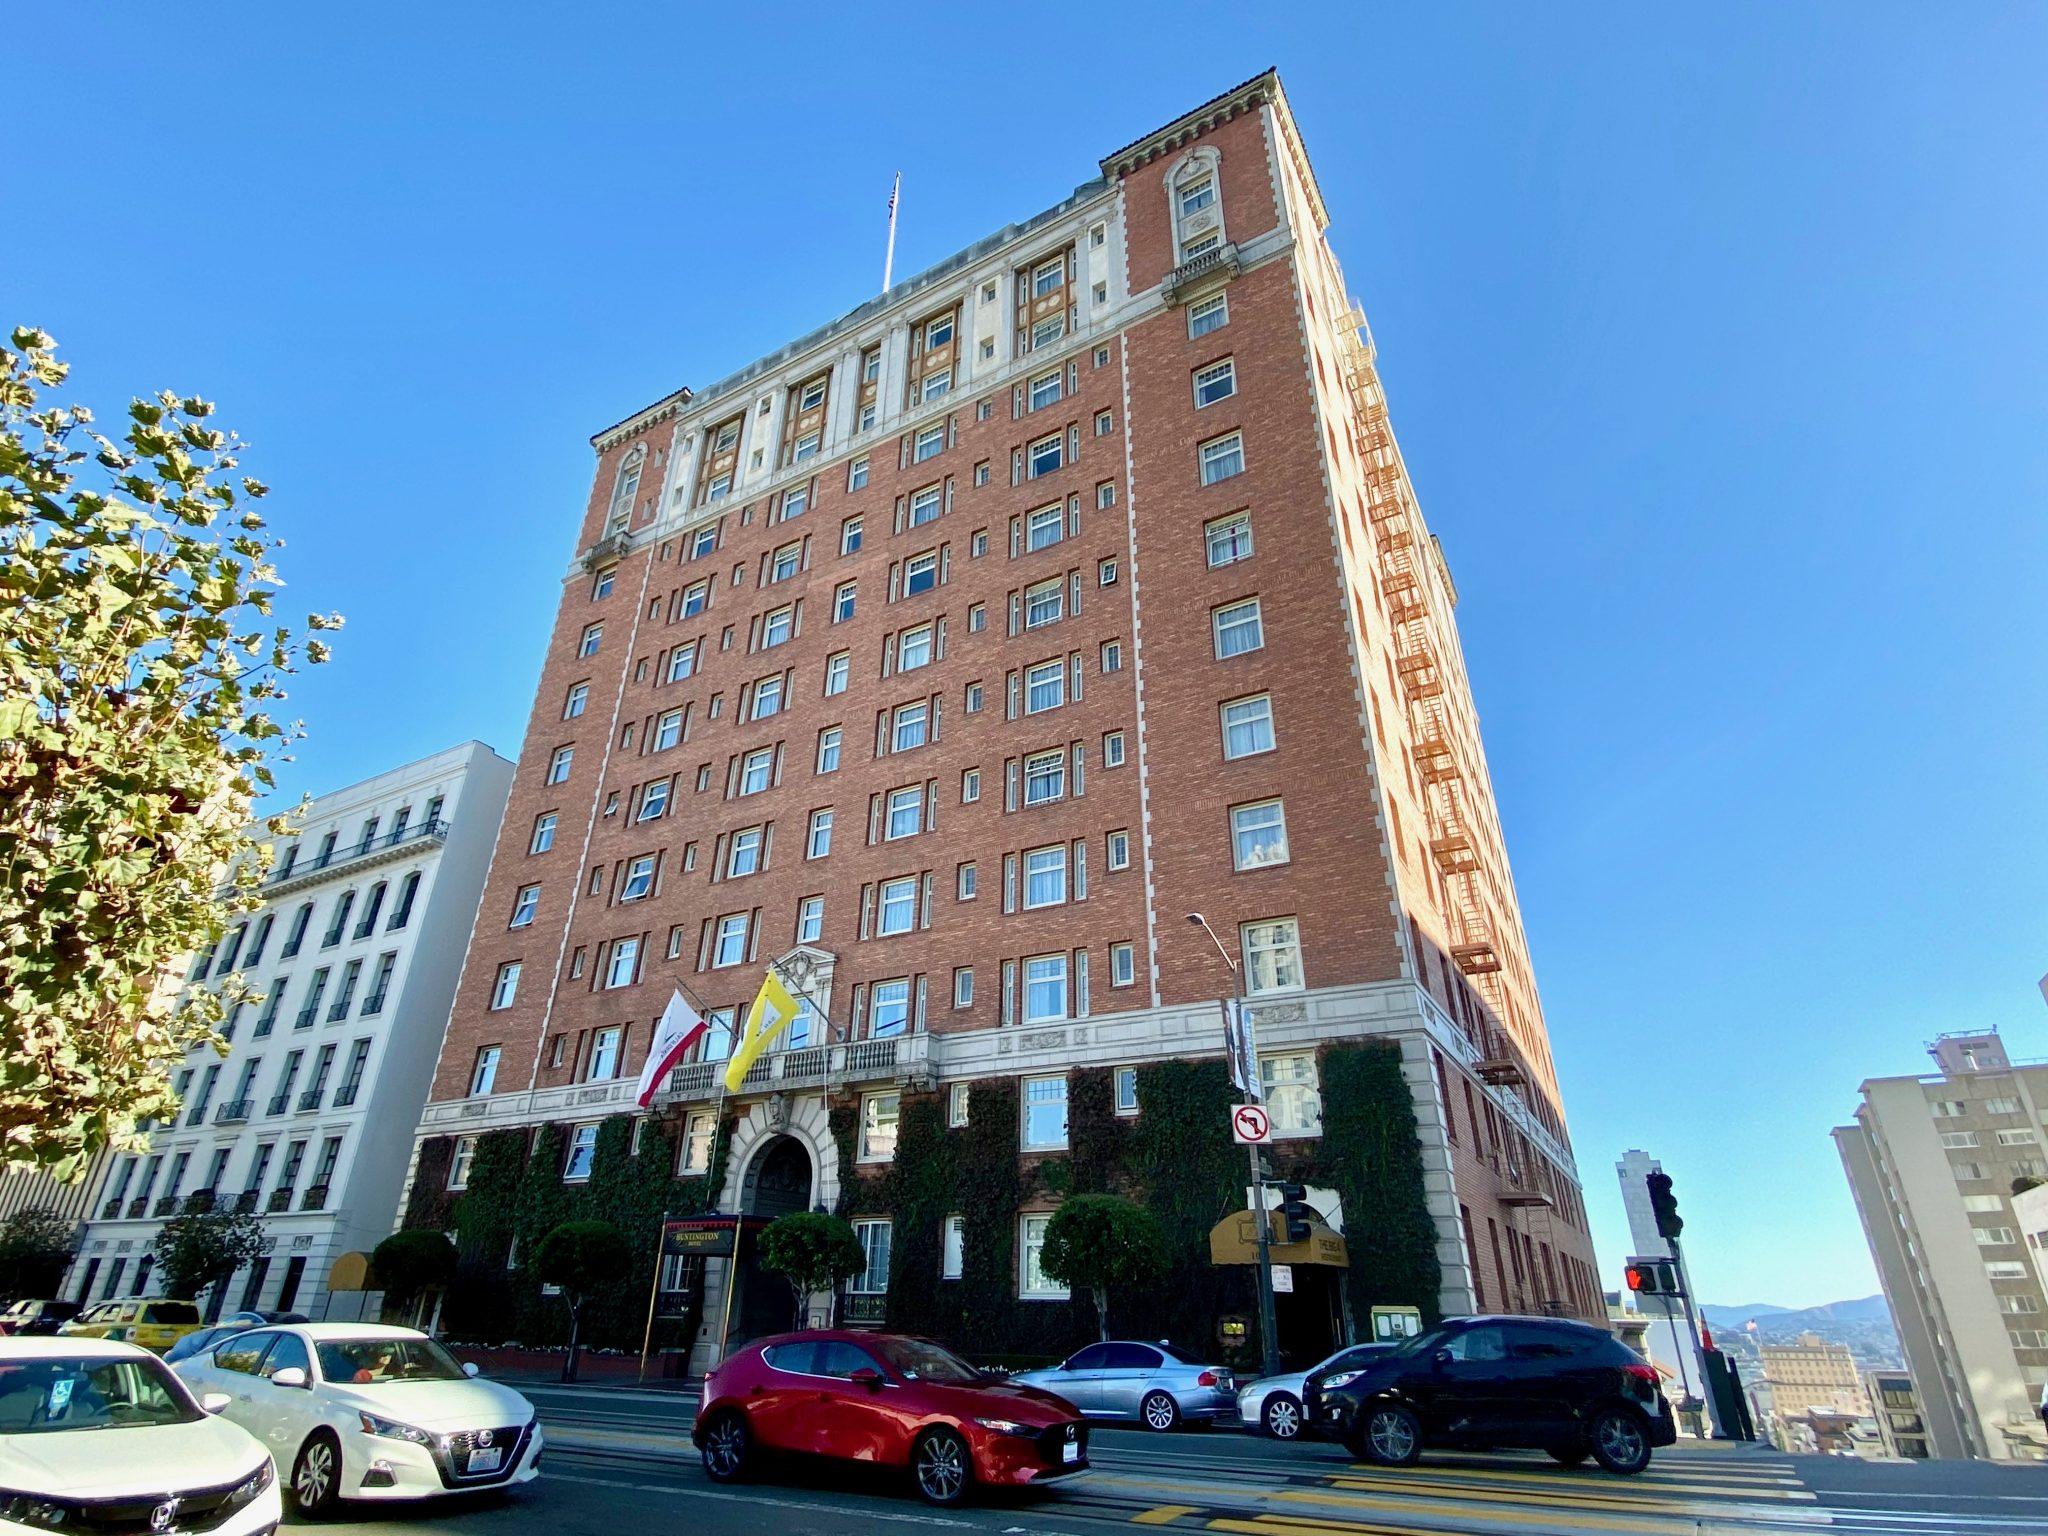 Huntington Hotel exterior, San Francisco